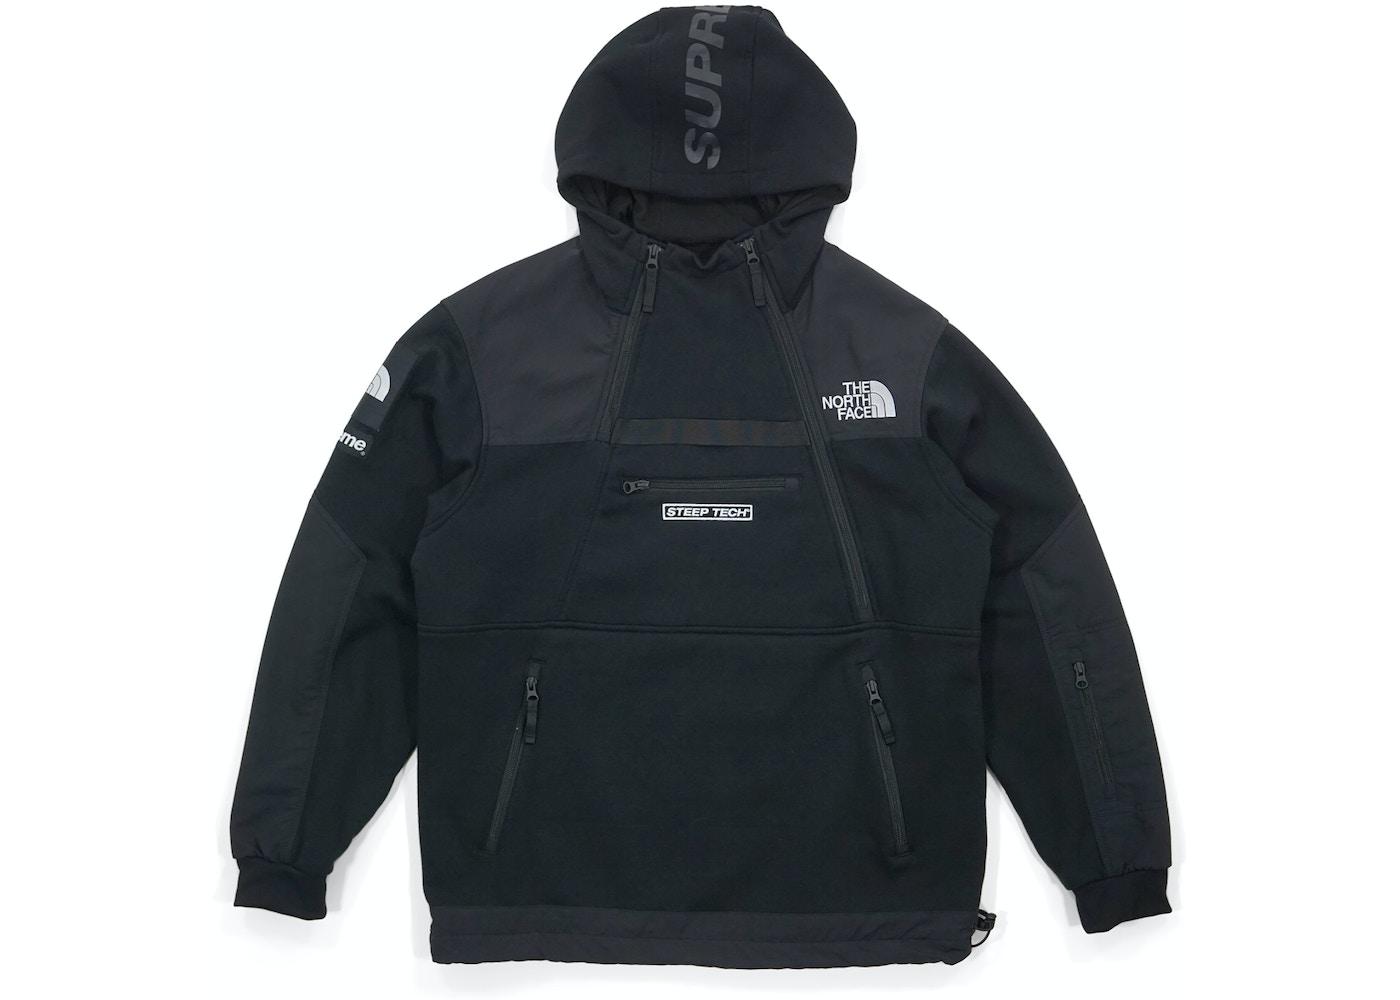 b724d50dd Supreme The North Face Steep Tech Hooded Sweatshirt Black